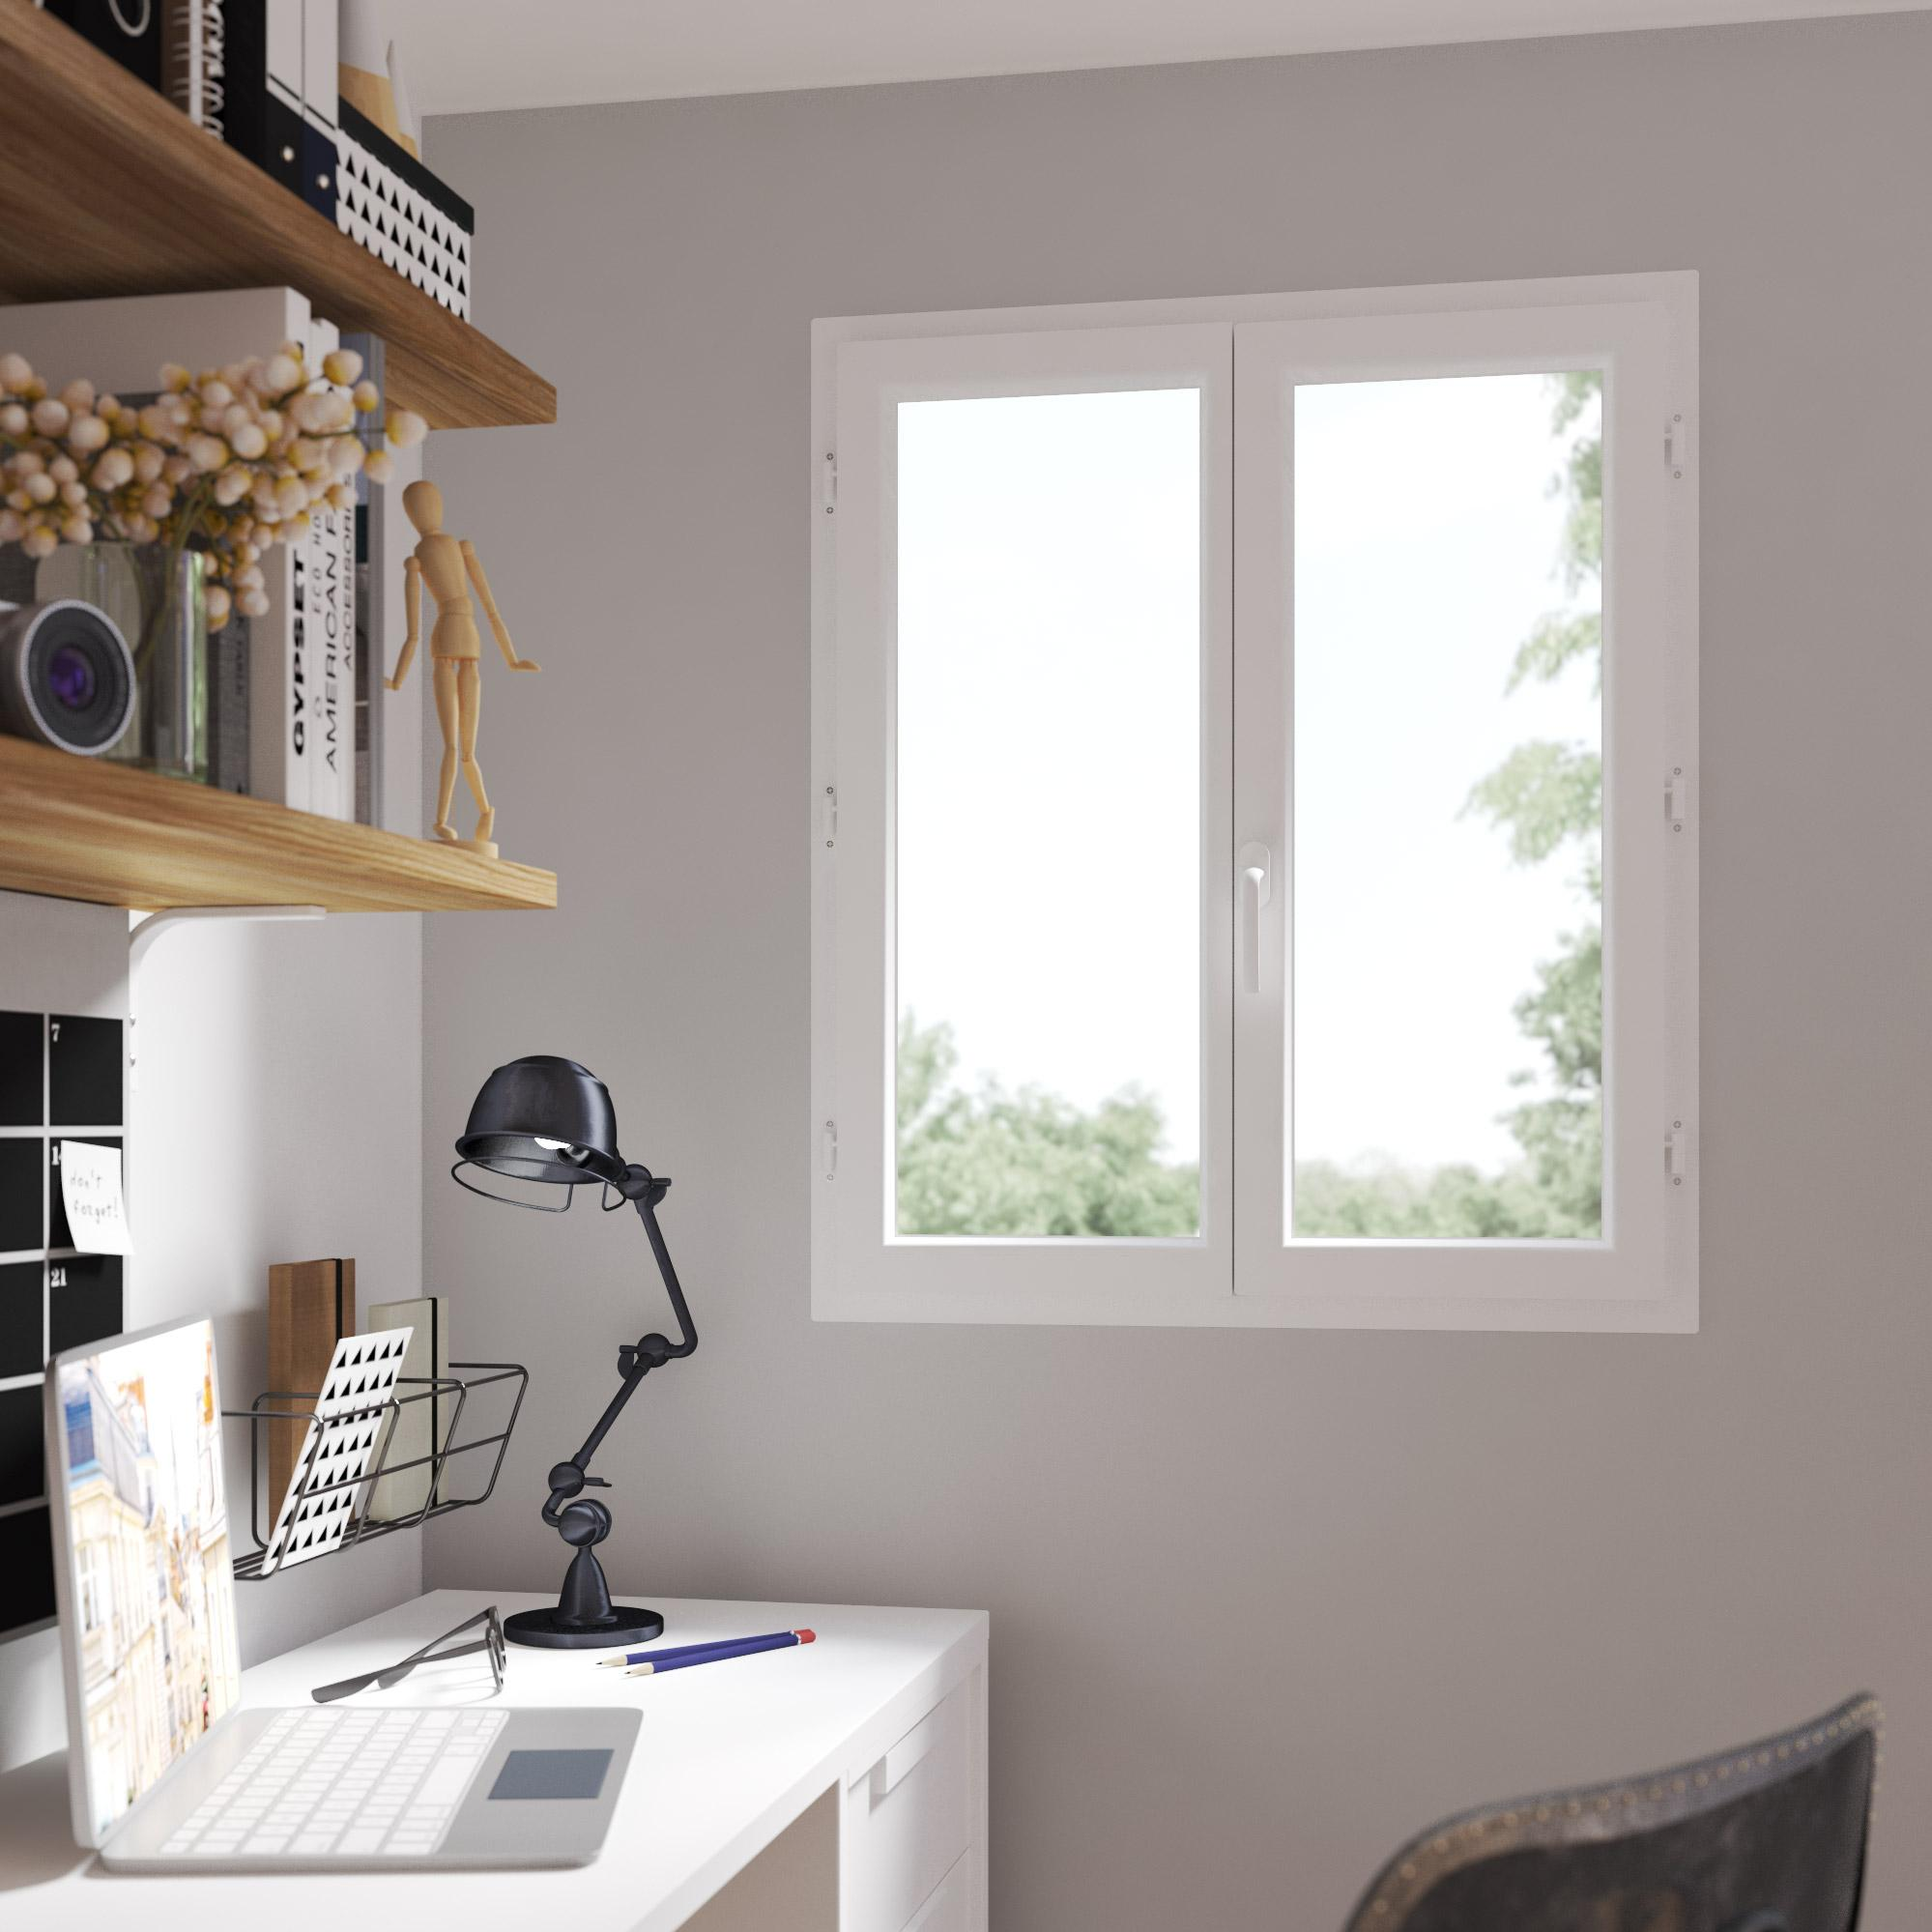 Fenêtre PVC H.105 x l.100 cm, blanc / blanc, 2 tirant droit